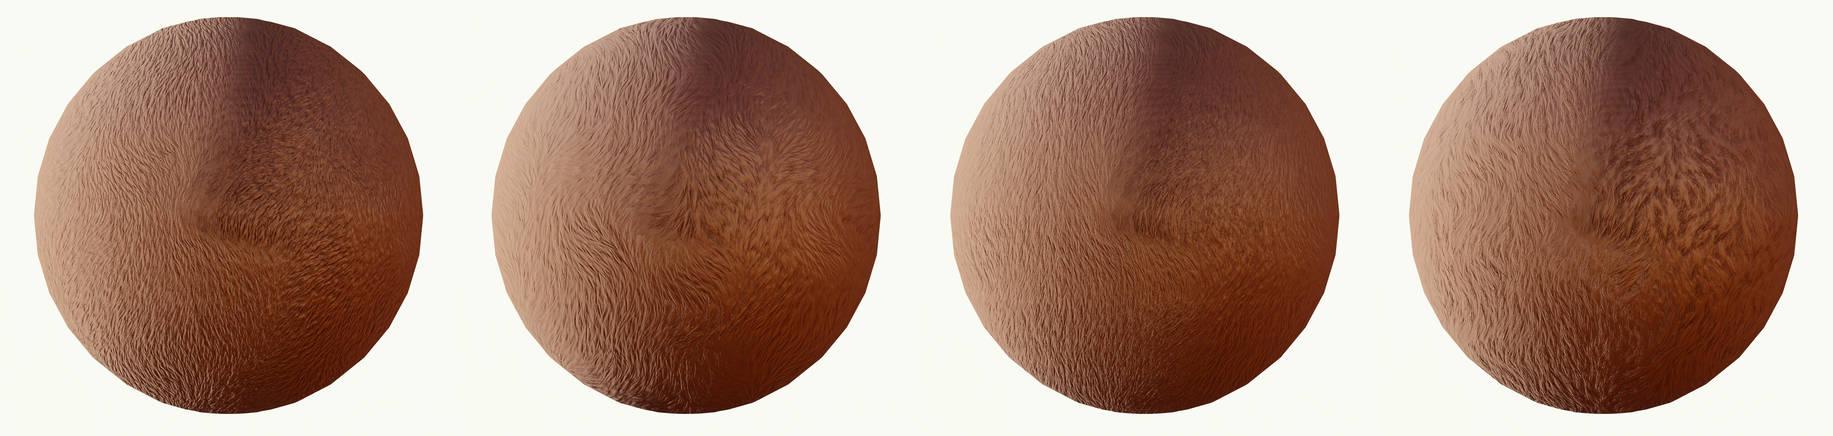 [MMD] Fur Normal Maps for Raycast - DL